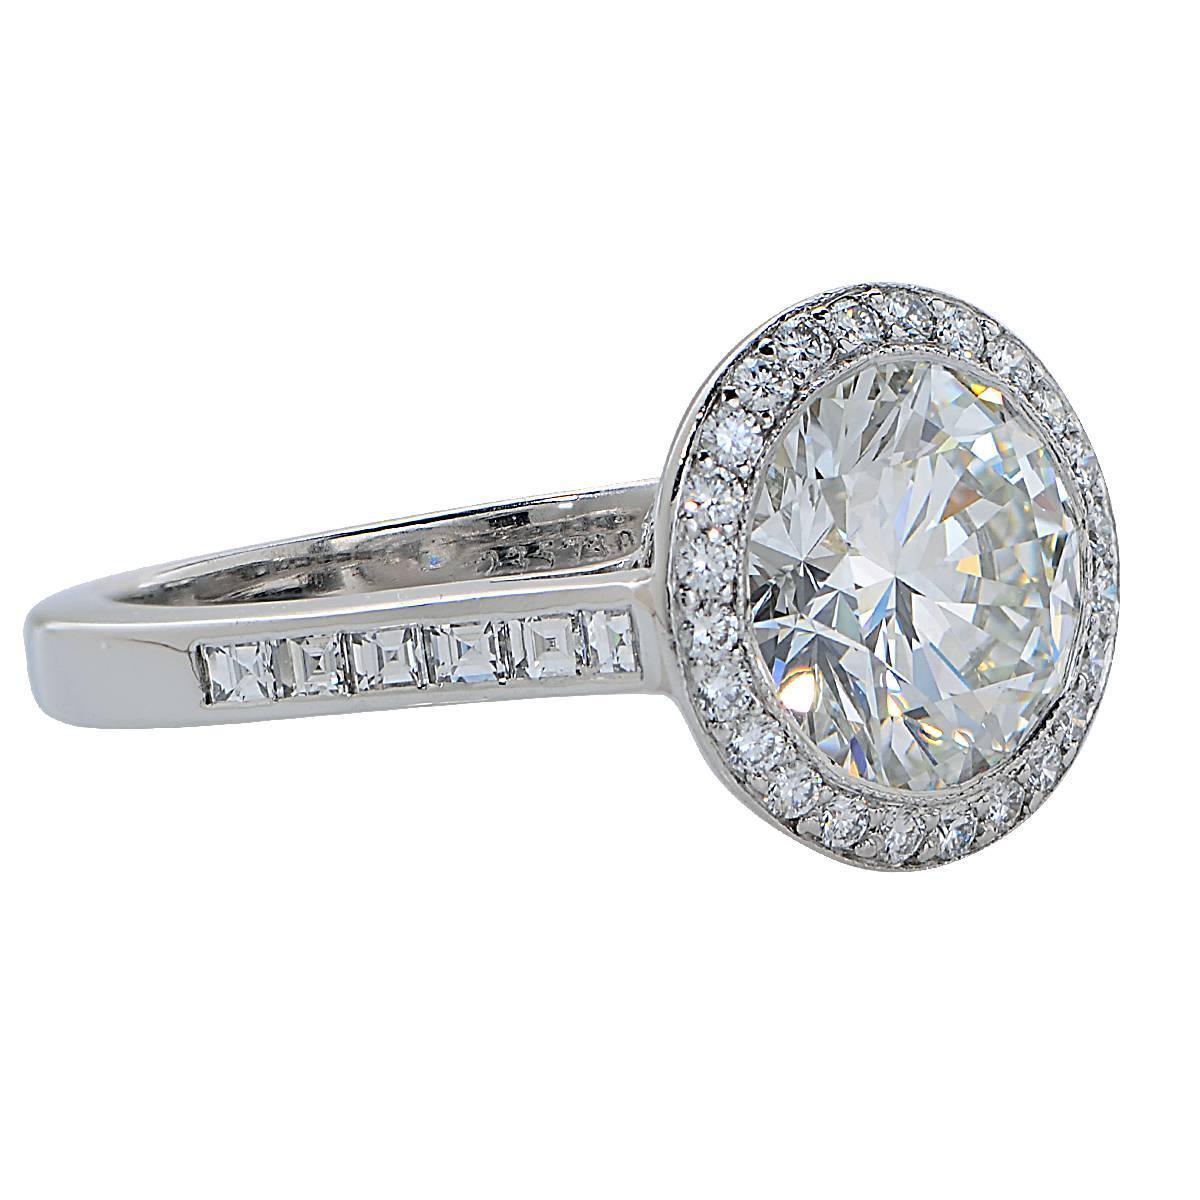 Tiffany and Co 2 47 Carat Diamond Platinum Engagement Ring at 1stdibs